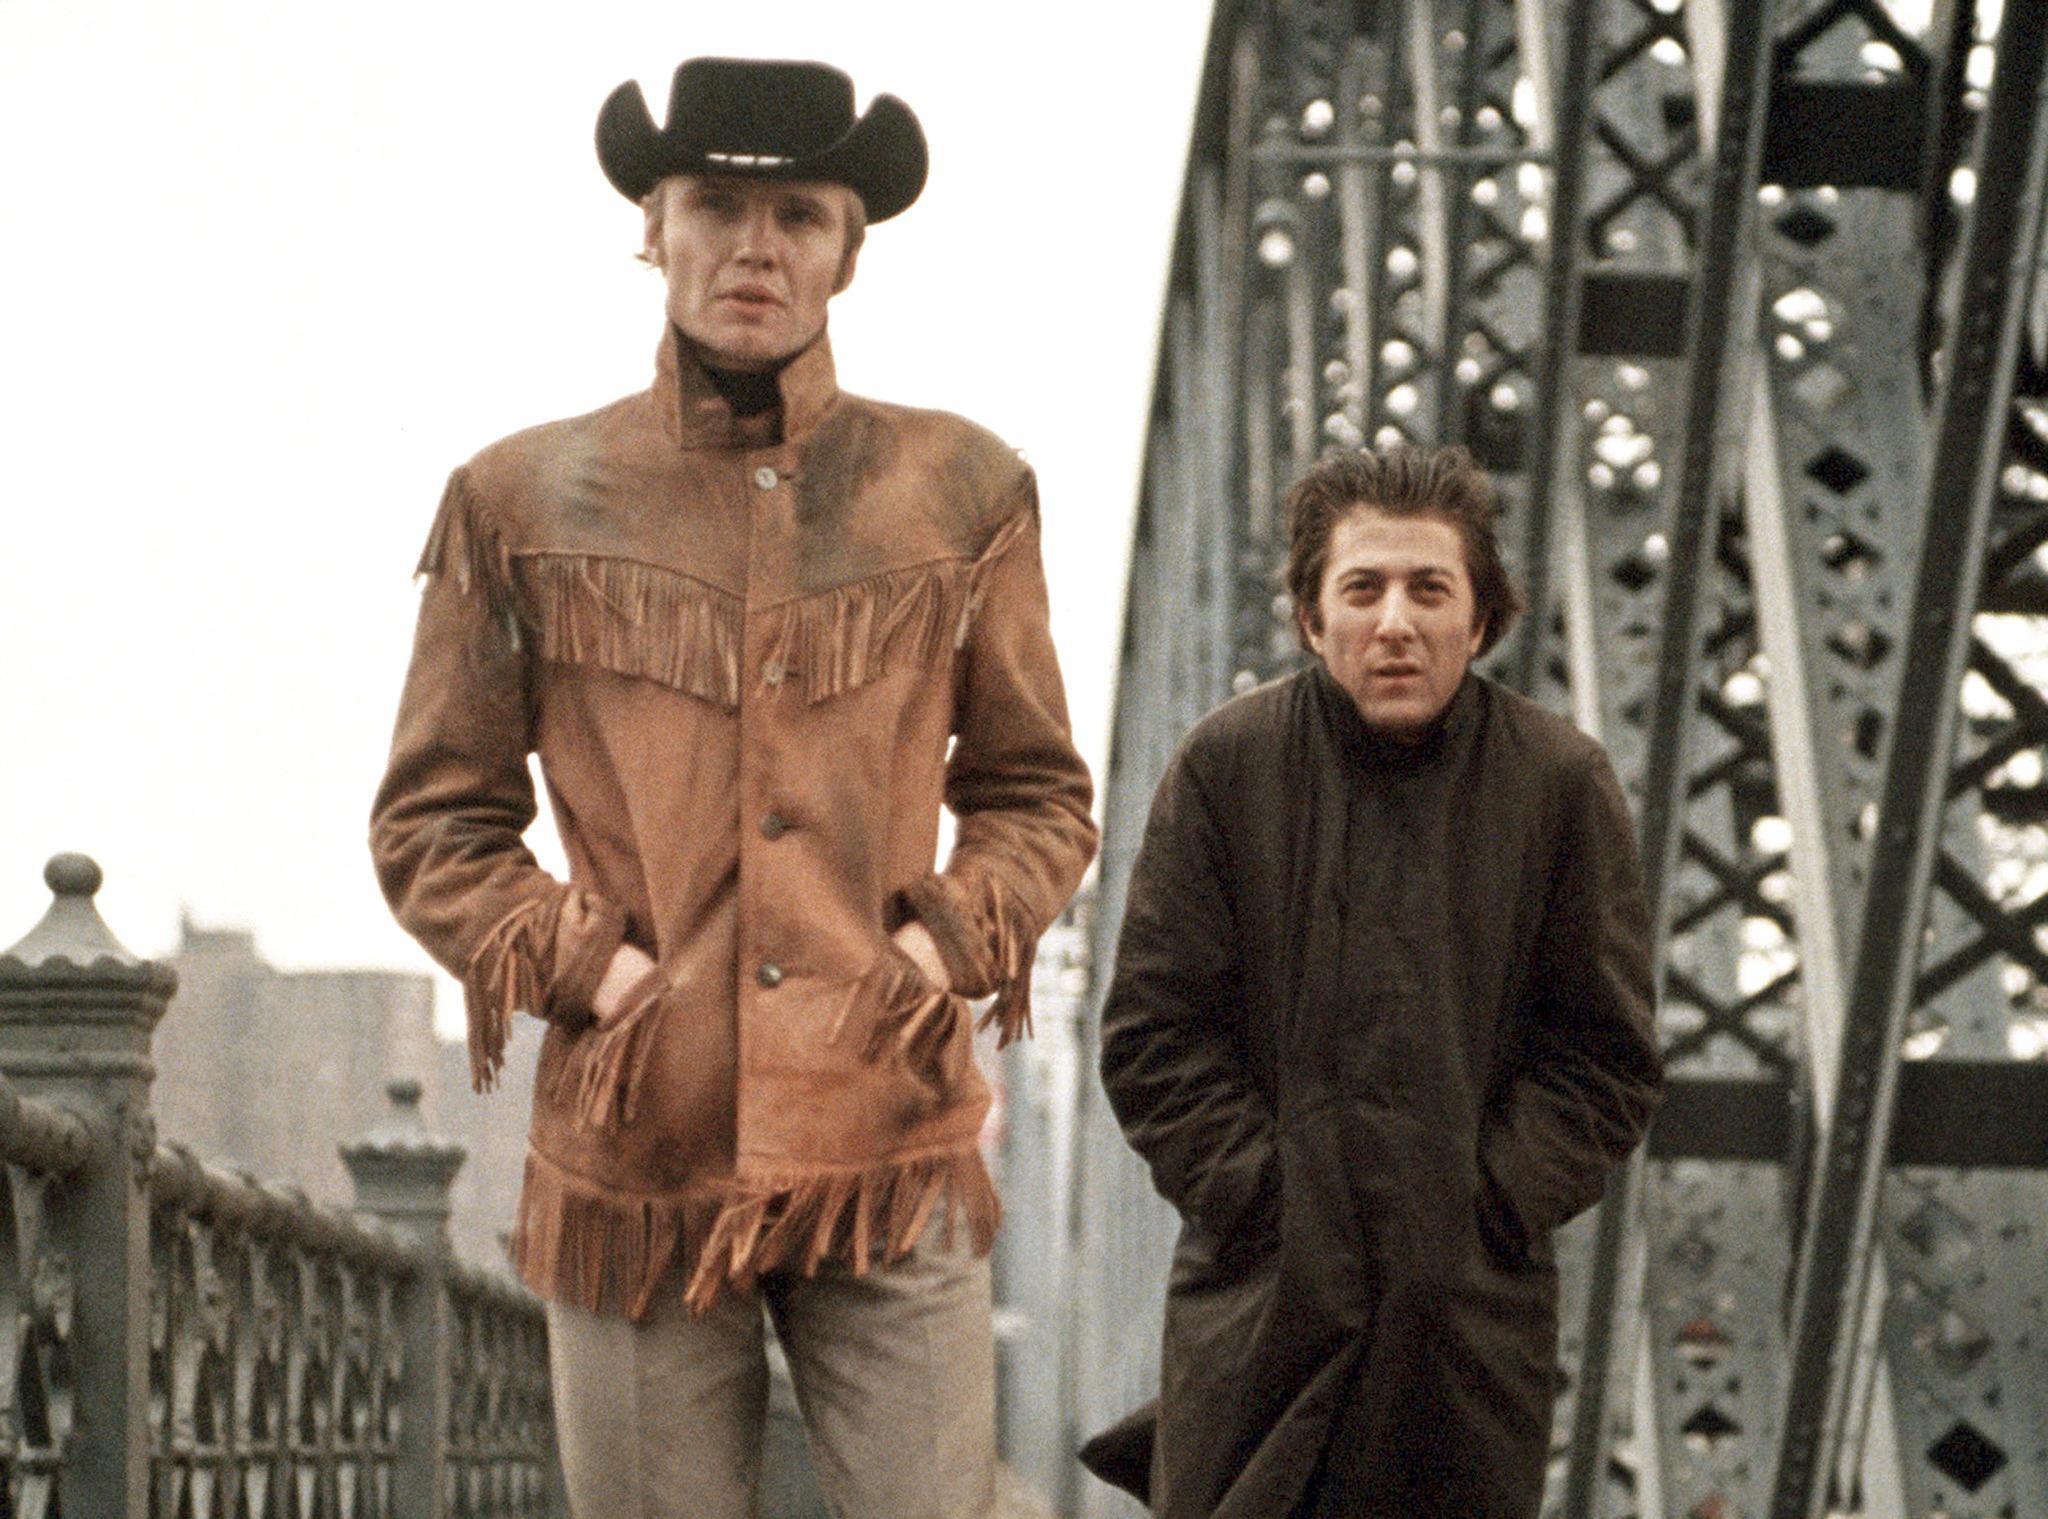 dustin-hoffman-and-jon-voight-in-midnight-cowboy-1969